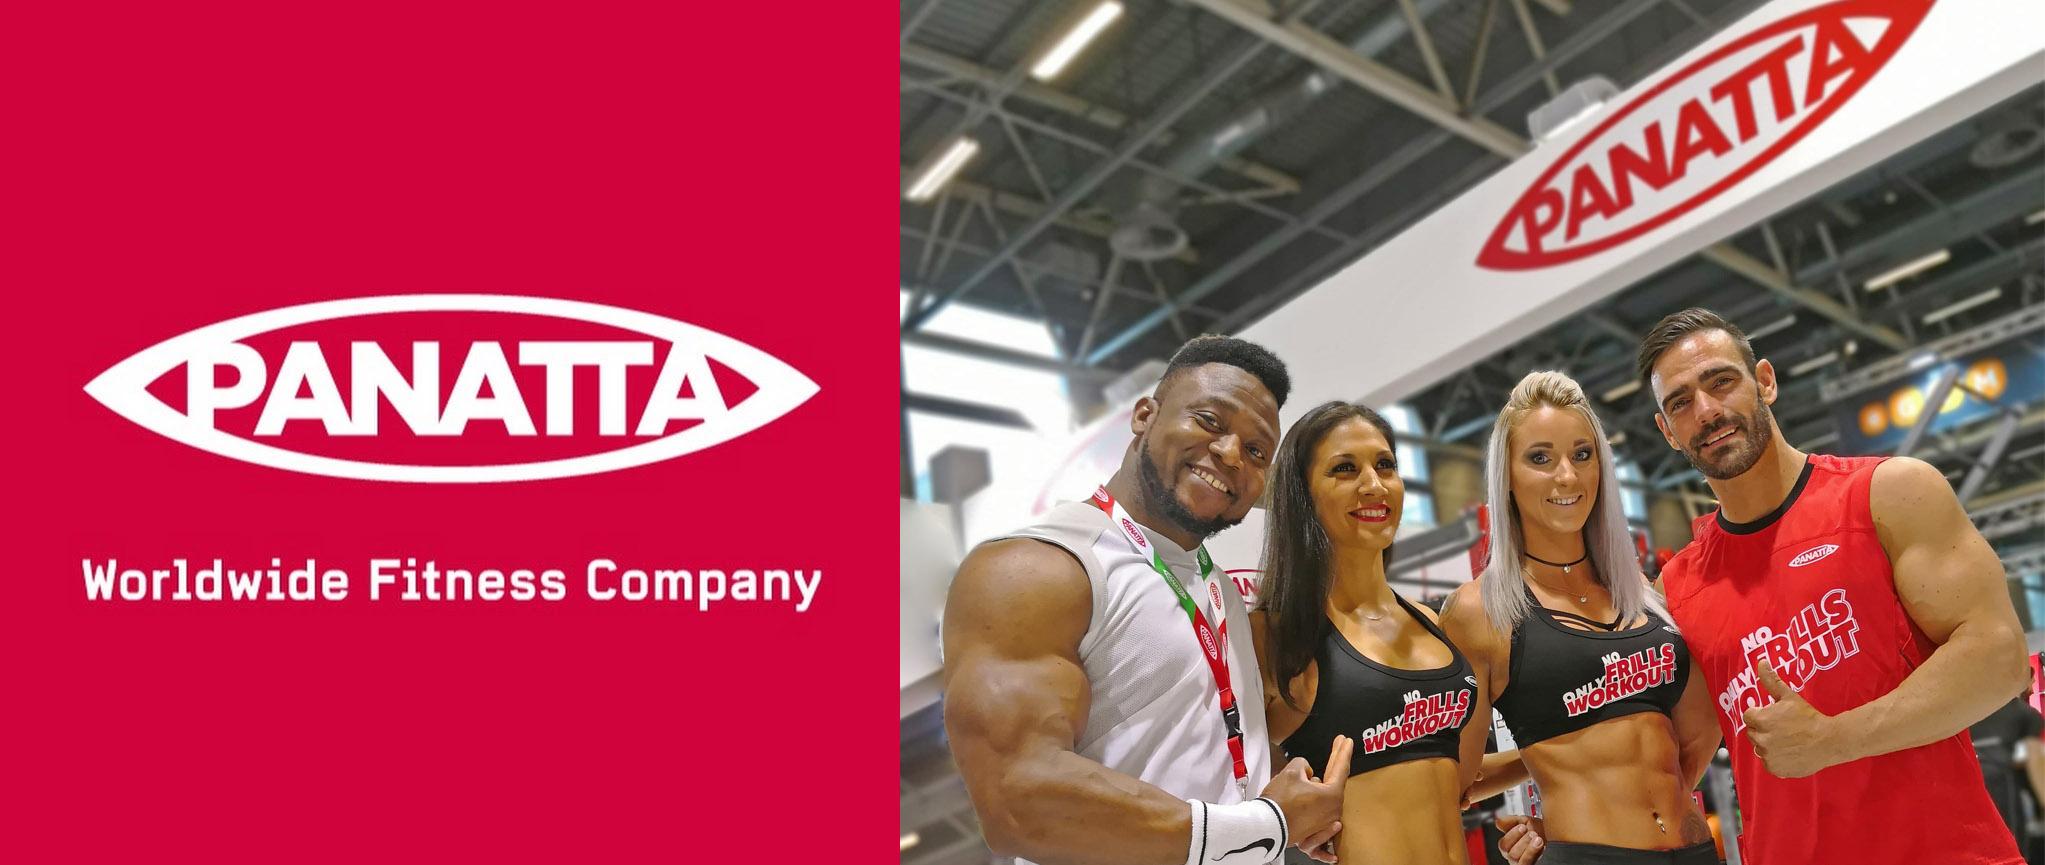 Abraham Zalo - Partenaire PANATTA Woldwide Fitness Company